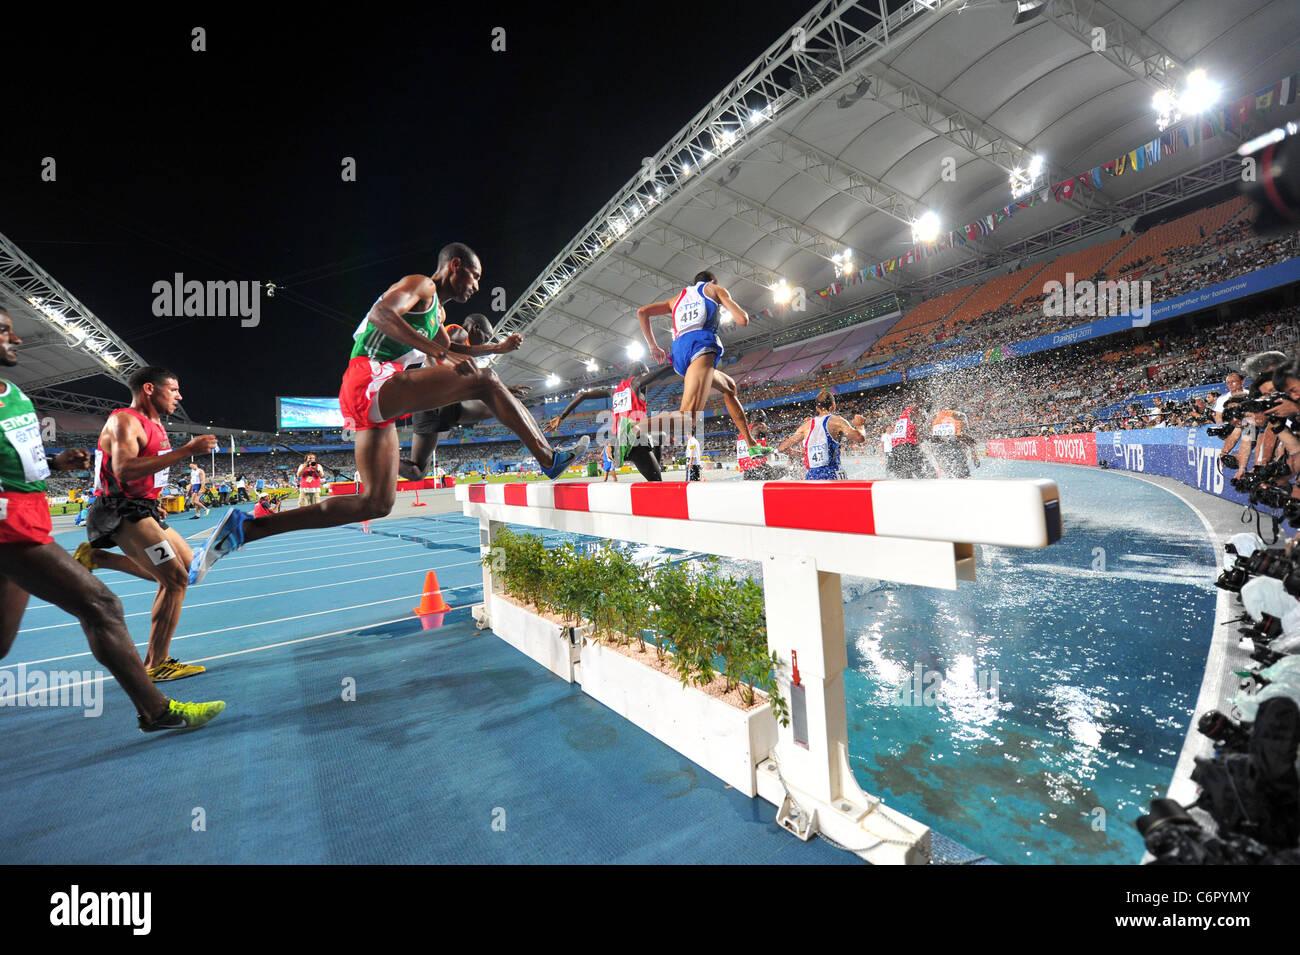 L'ambiance shot del XIII IAAF Campionati del Mondo di atletica leggera. Immagini Stock